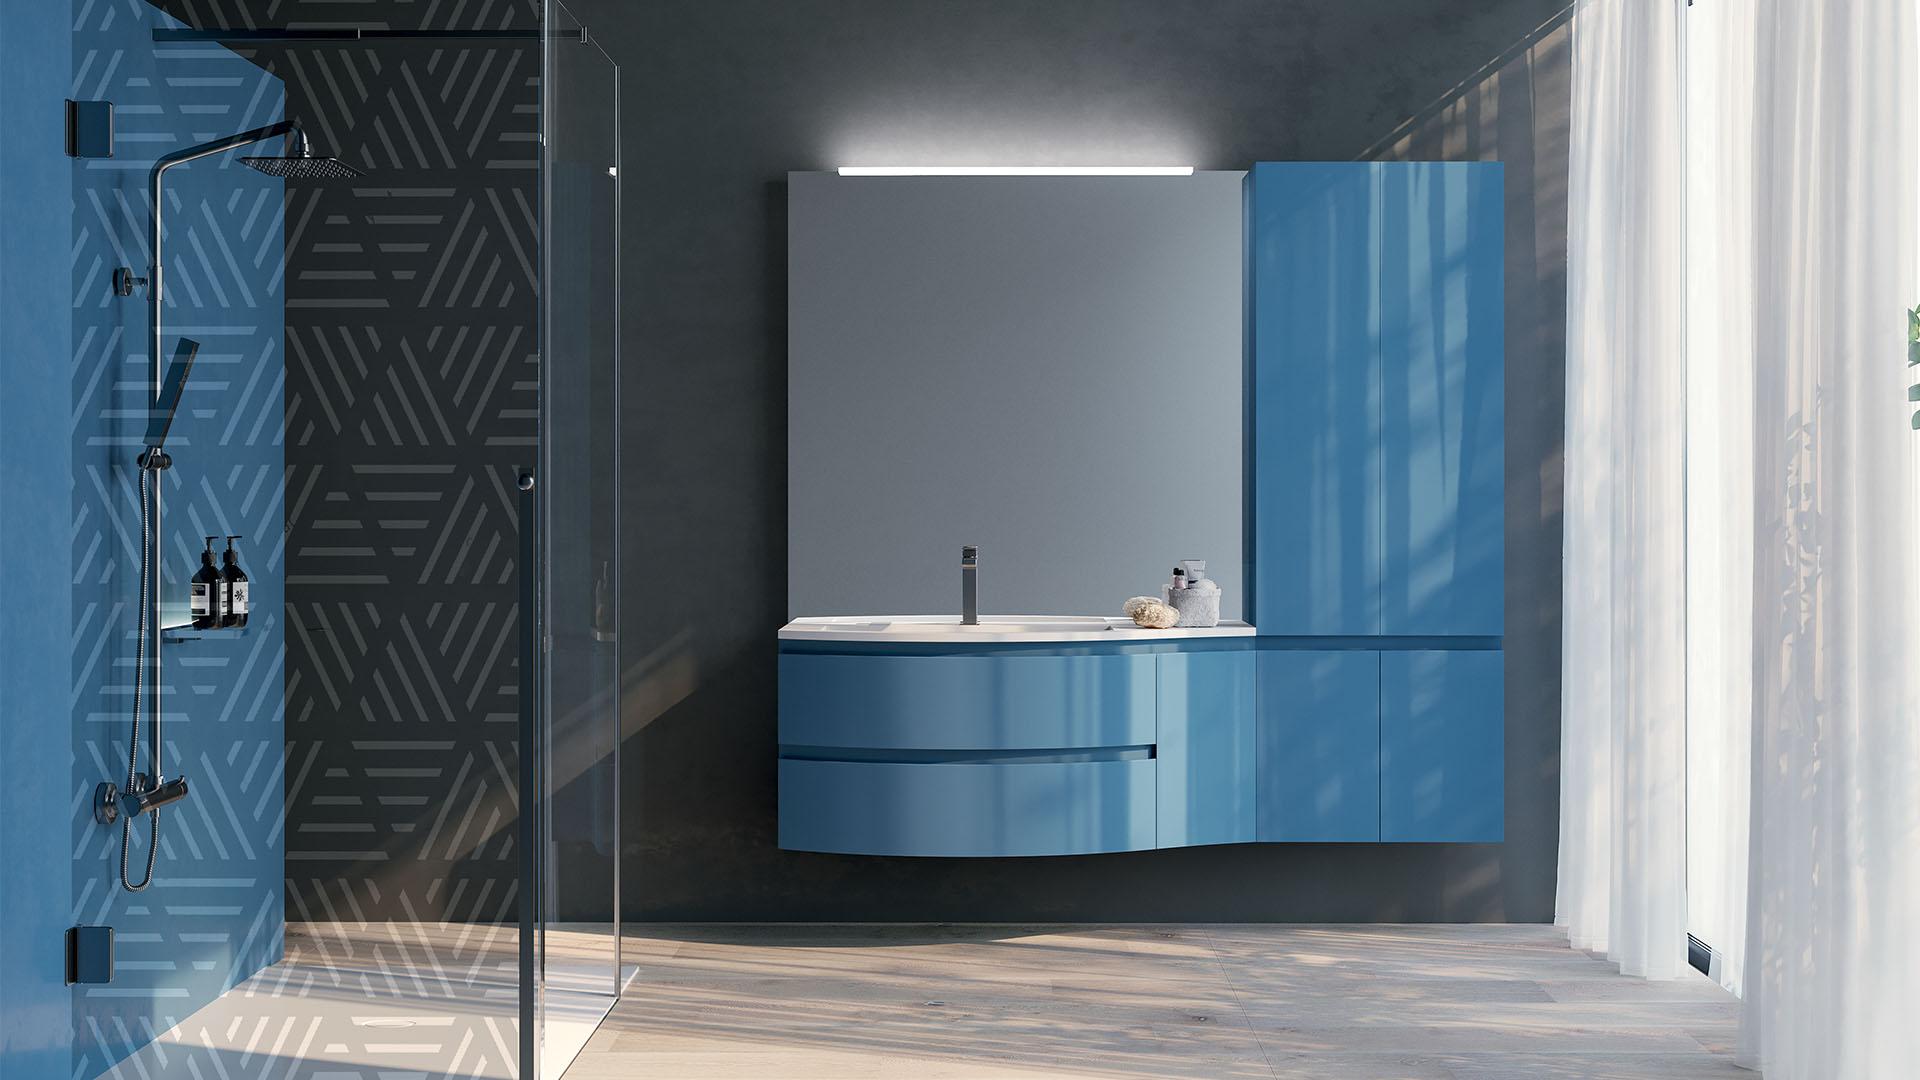 Bathroom Happy 11 - Licor Design